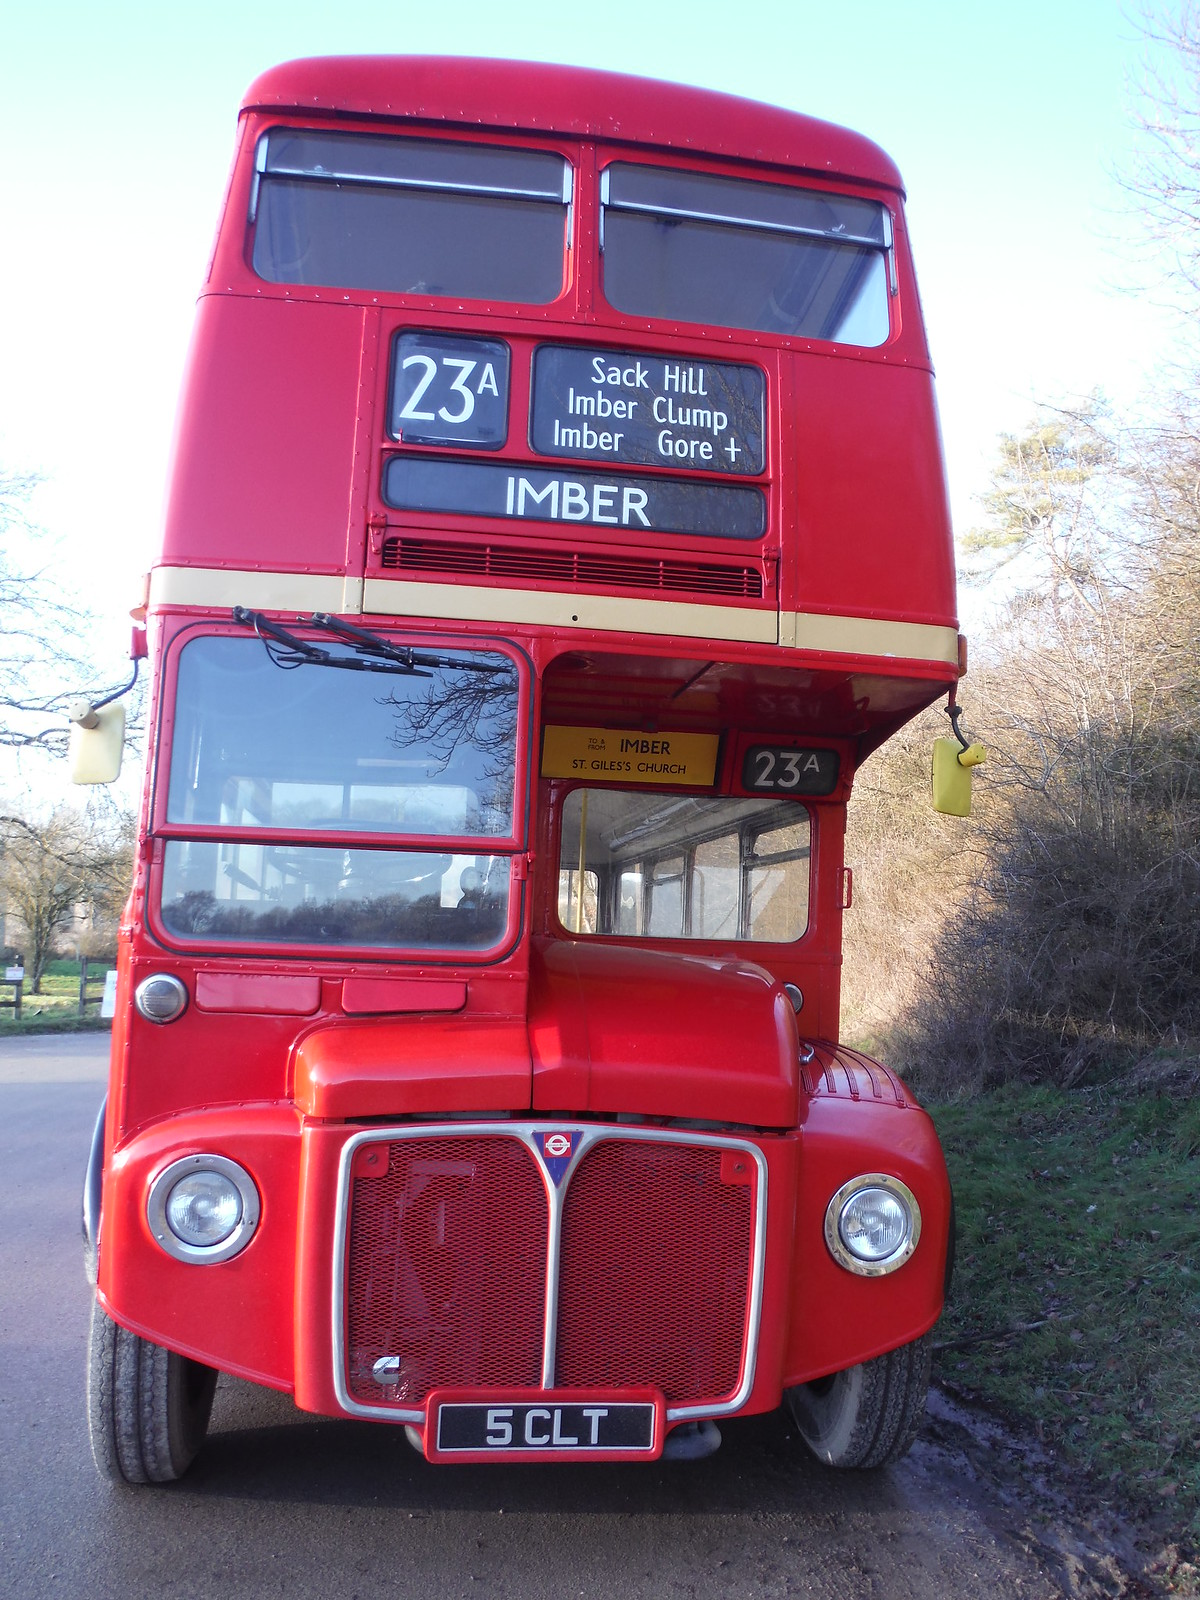 Warminster - Imber Shuttle Bus SWC Walk 286 Westbury to Warminster (via Imber Range)